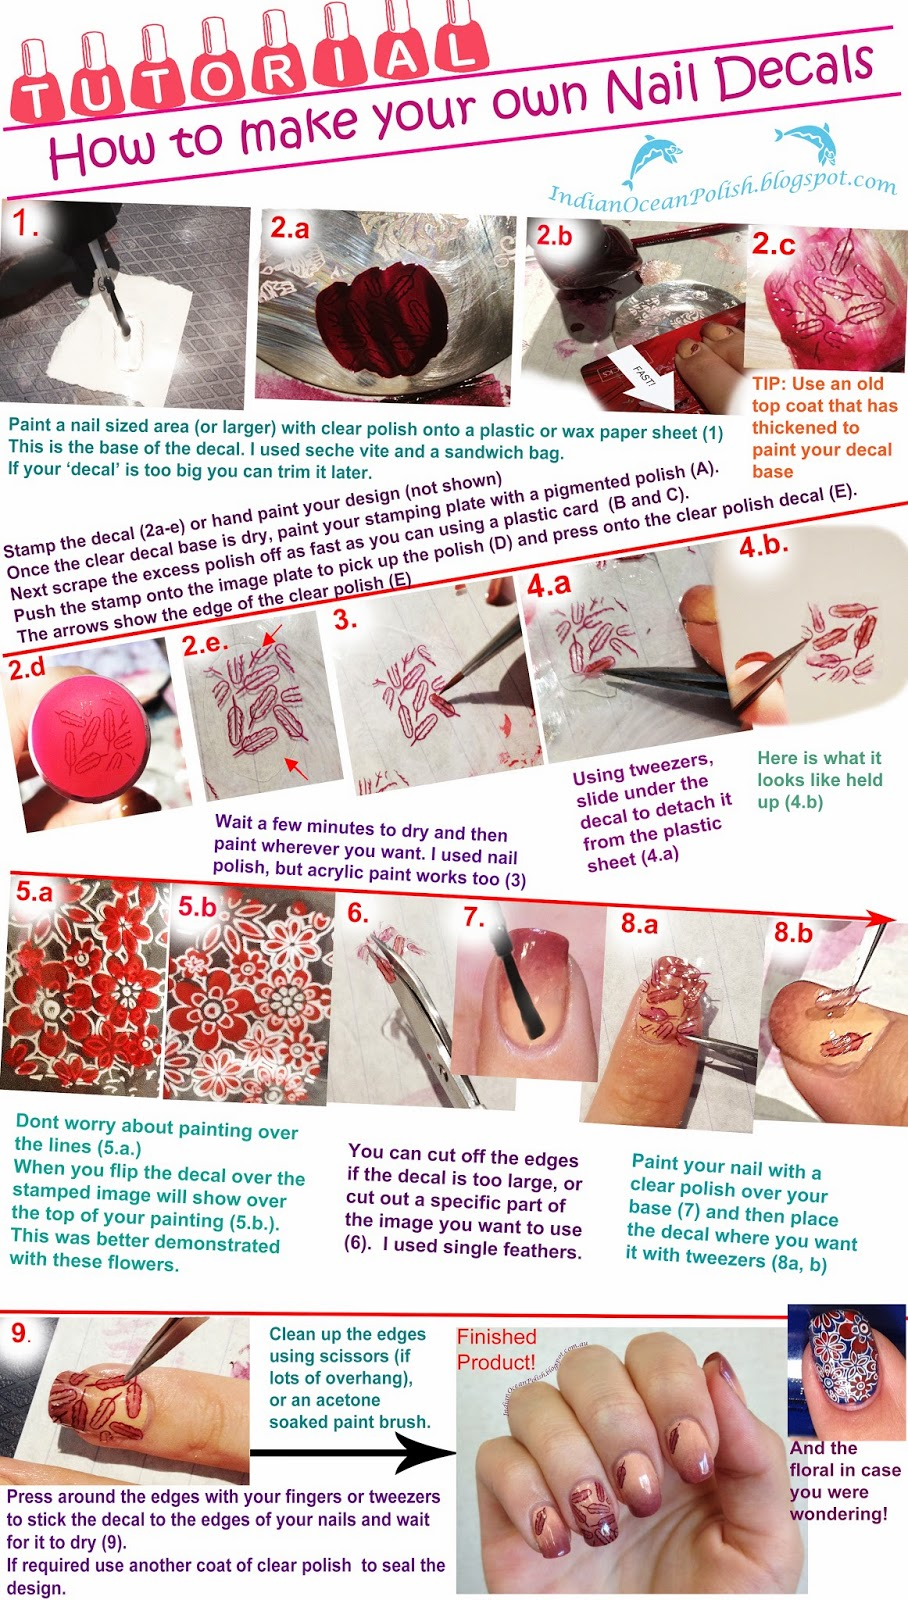 How to make your own nail art pen image collections nail art and own nail art gallery nail art and nail design ideas making nail art decals wrapartist nail prinsesfo Choice Image